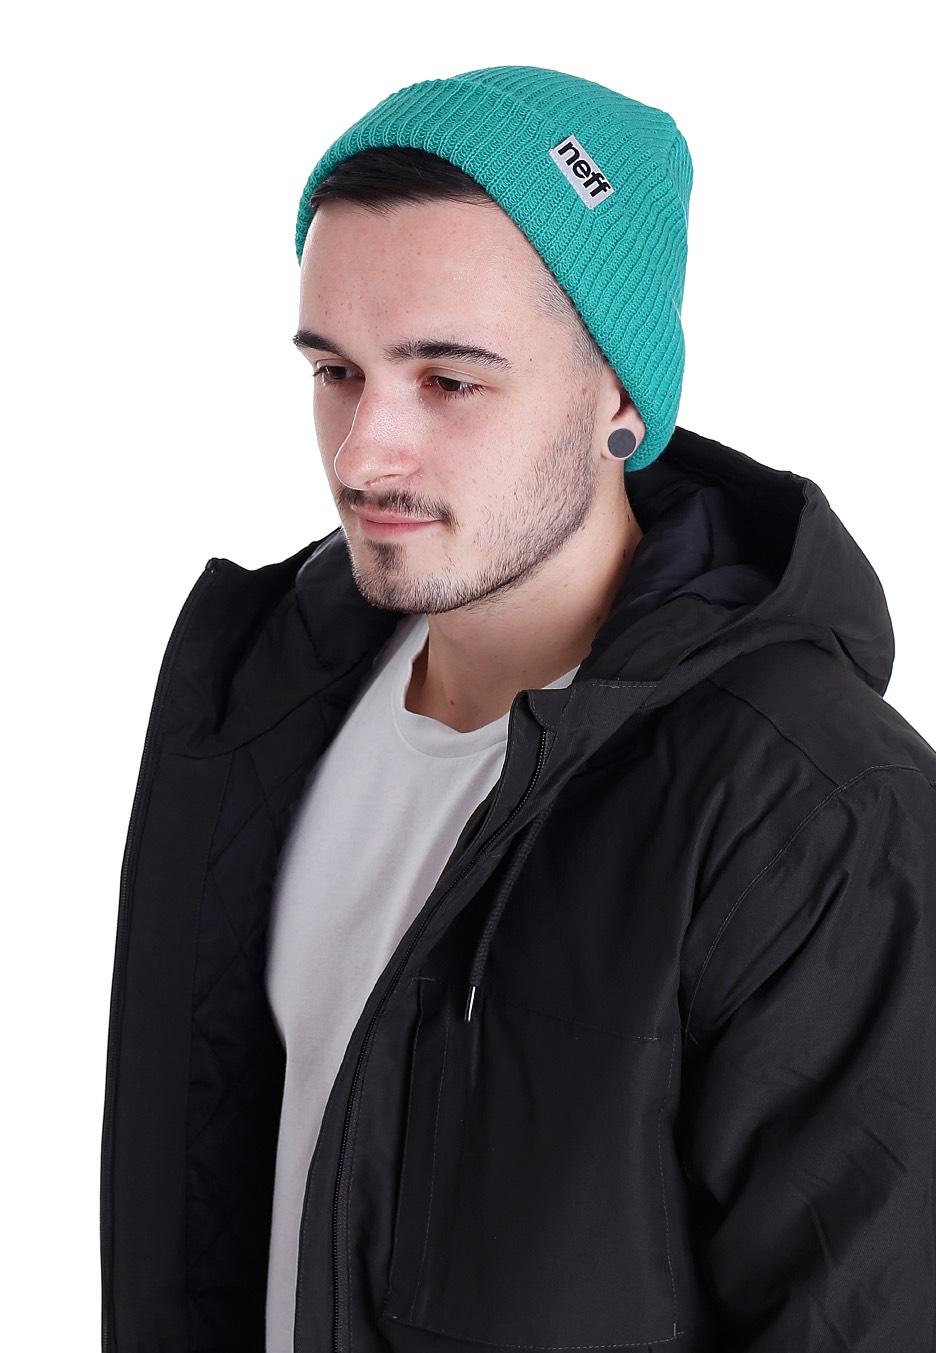 f6c9c47fa3a Neff fold teal beanie streetwear shop jpg 936x1353 Neff beanies tumblr